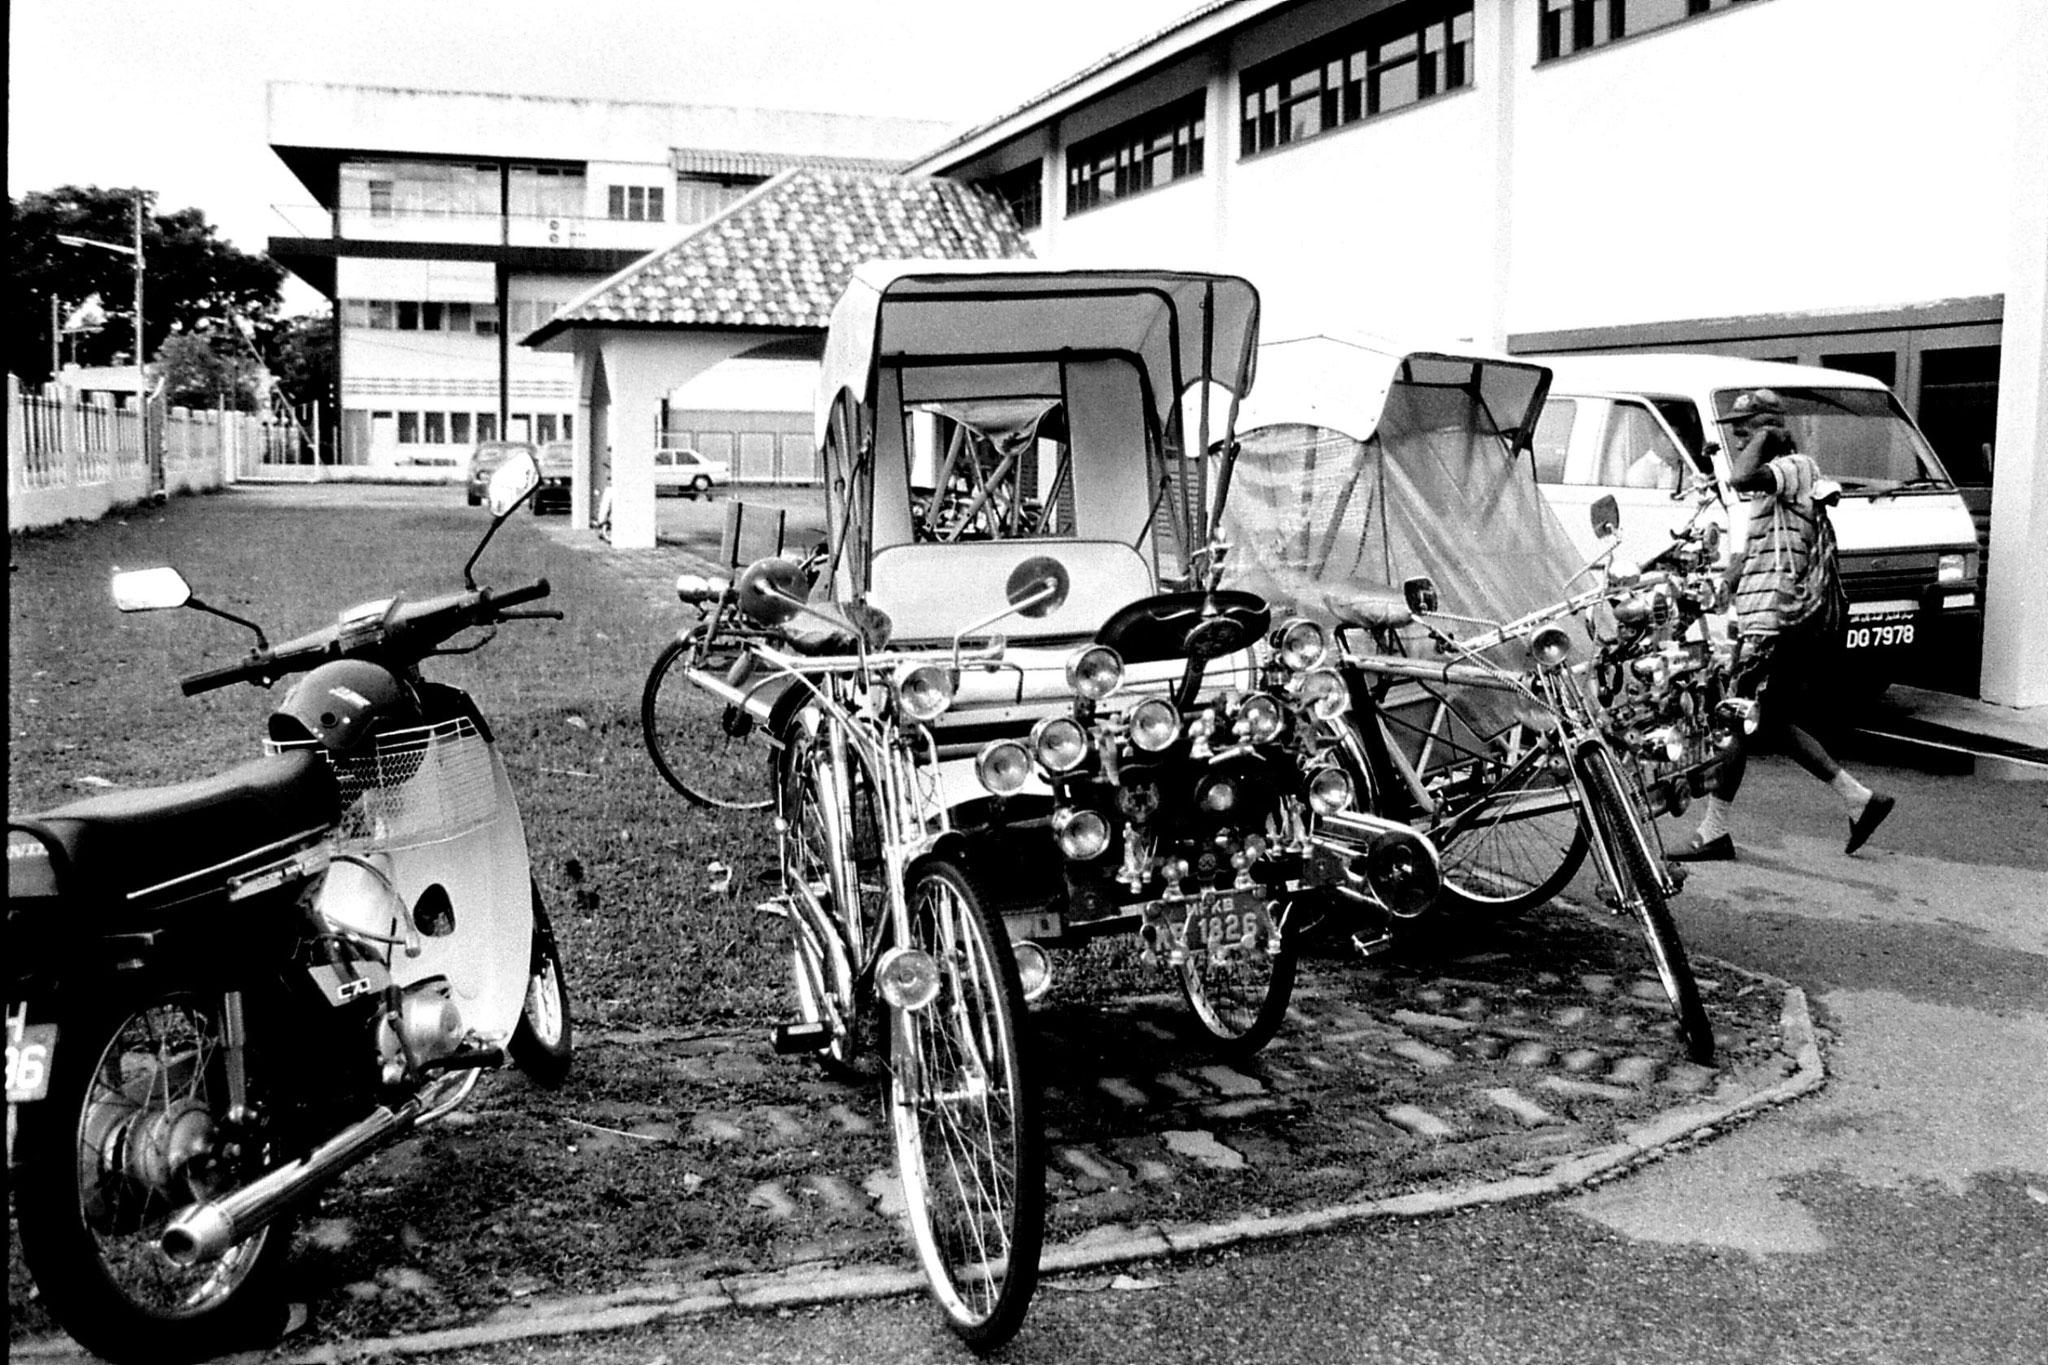 20/6/1990: 30: Kota Bharu cycle rickshaw stand